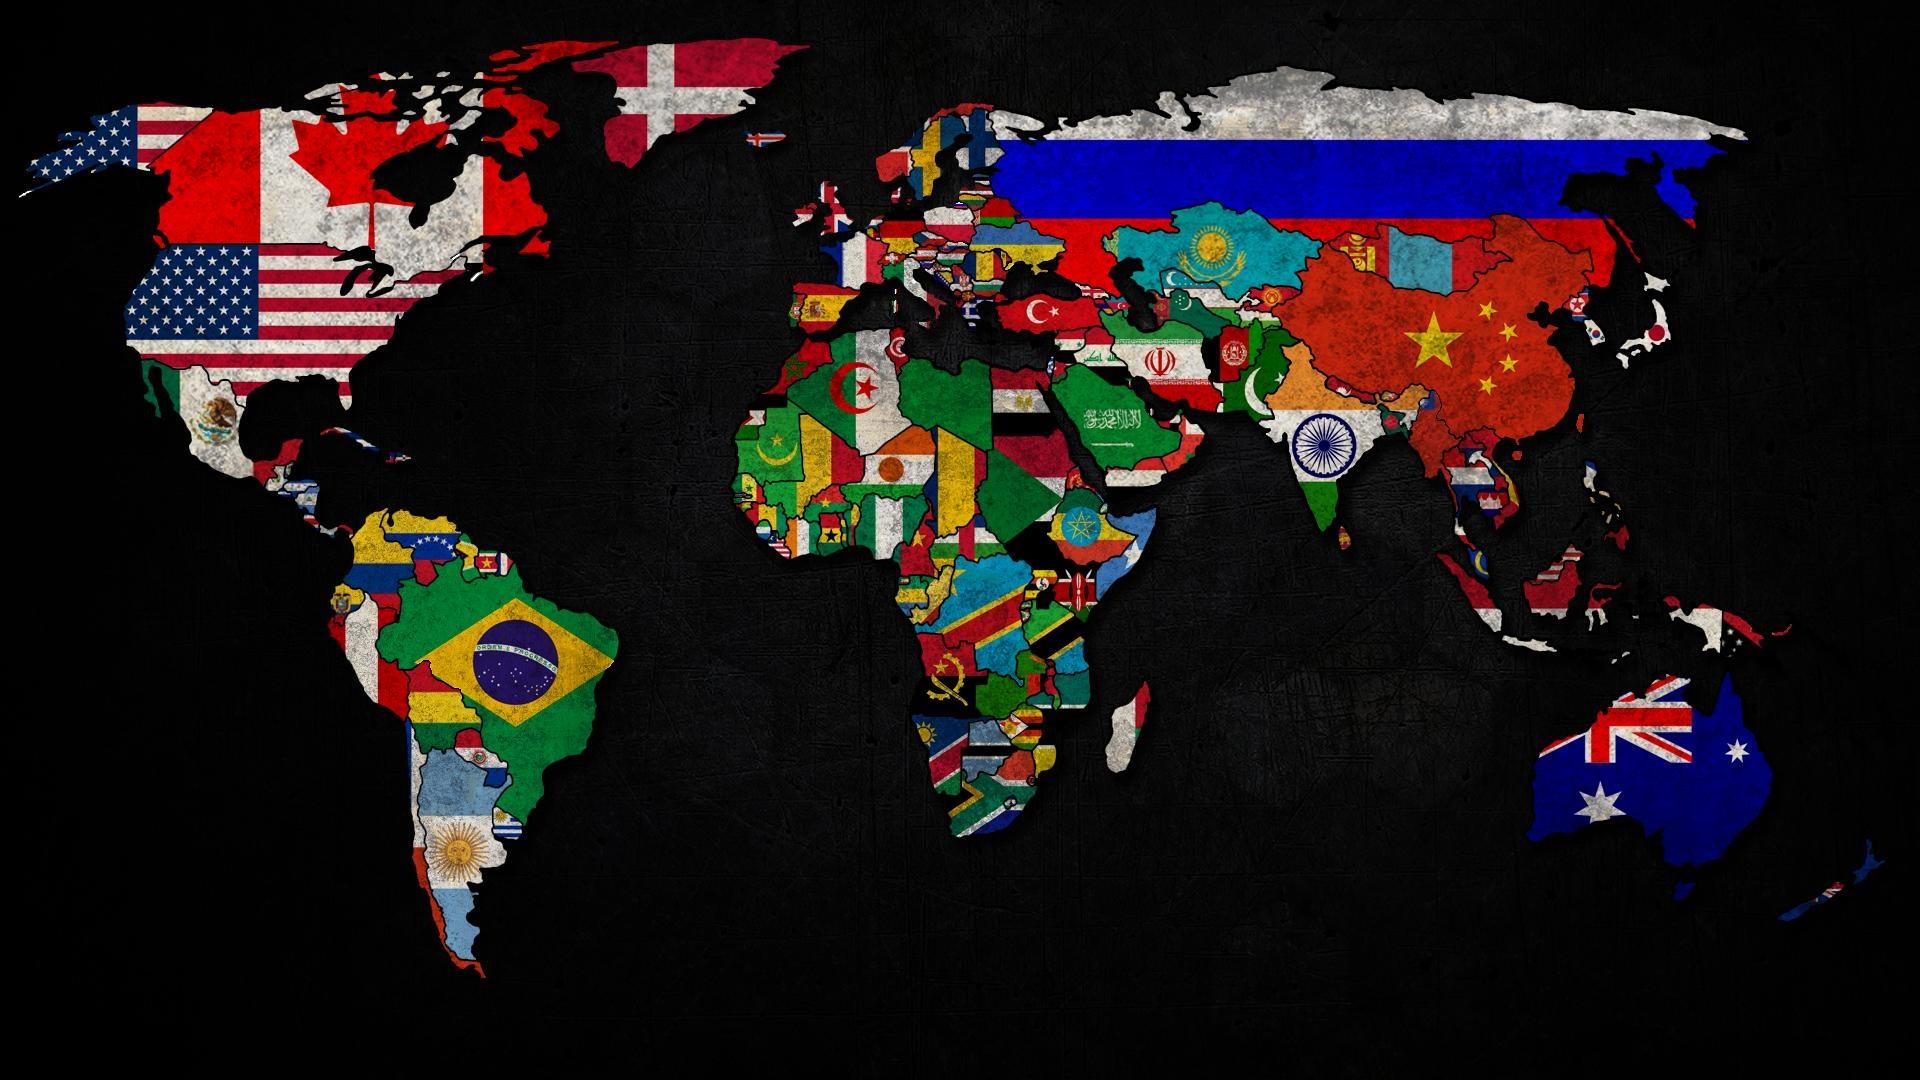 16 Luxury Pubg Wallpaper Iphone 6: 壁纸 世界地图与国旗徽标 1920x1080 Full HD 2K 高清壁纸, 图片, 照片